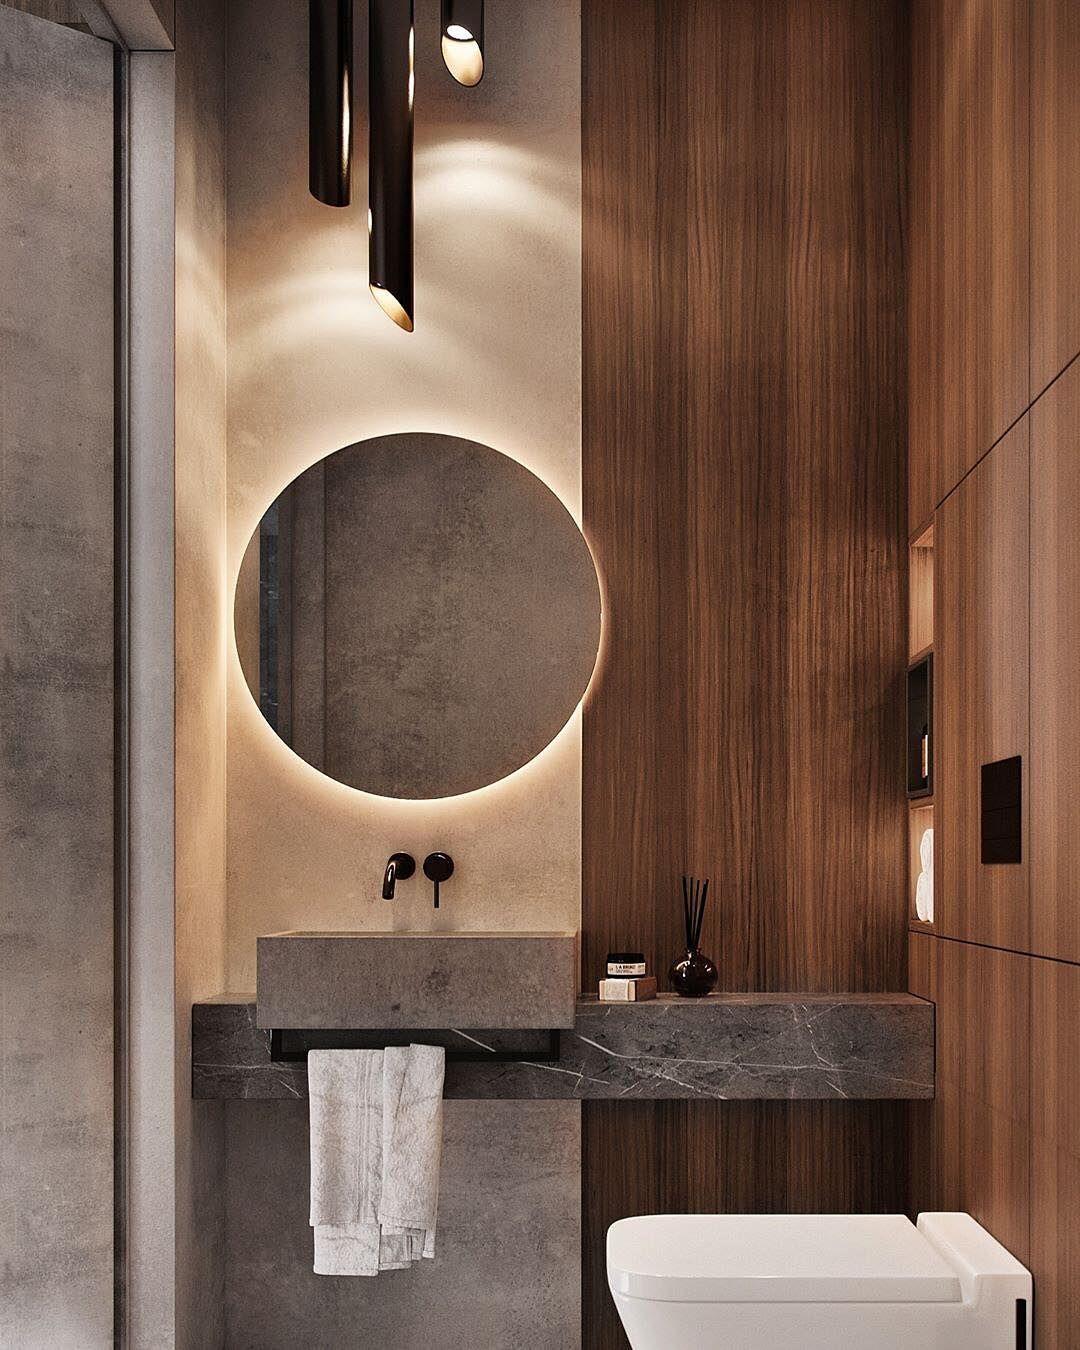 The Luxury Interior On Instagram Minimalist Modern Guest Bathroom Designed By Ato Studio In Moscow Ru Guest Bathroom Design Guest Bathroom Bathroom Interior